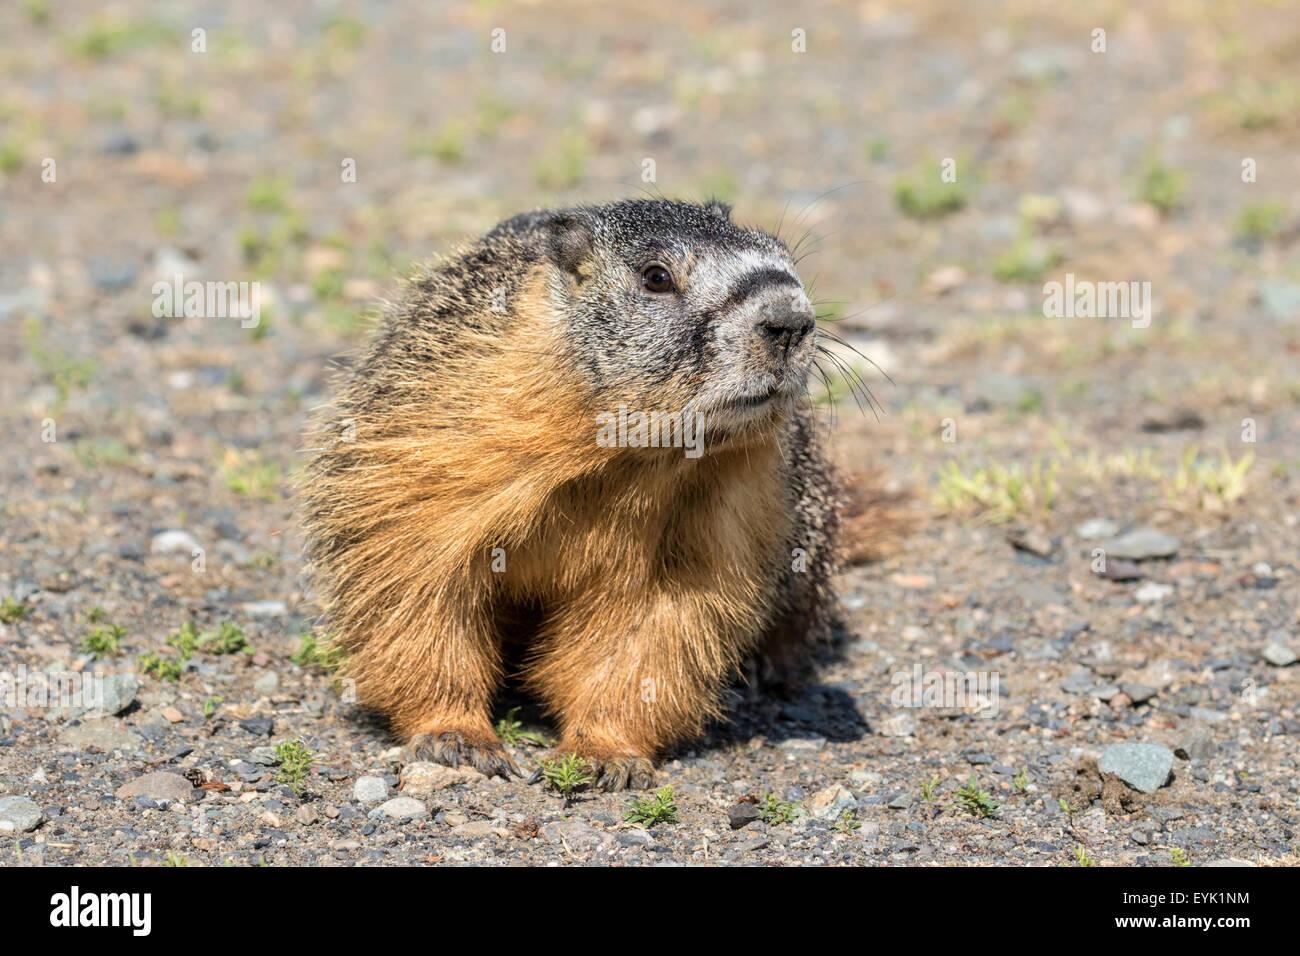 Yellow bellied Marmot - Marmota flaviventris - Stock Image